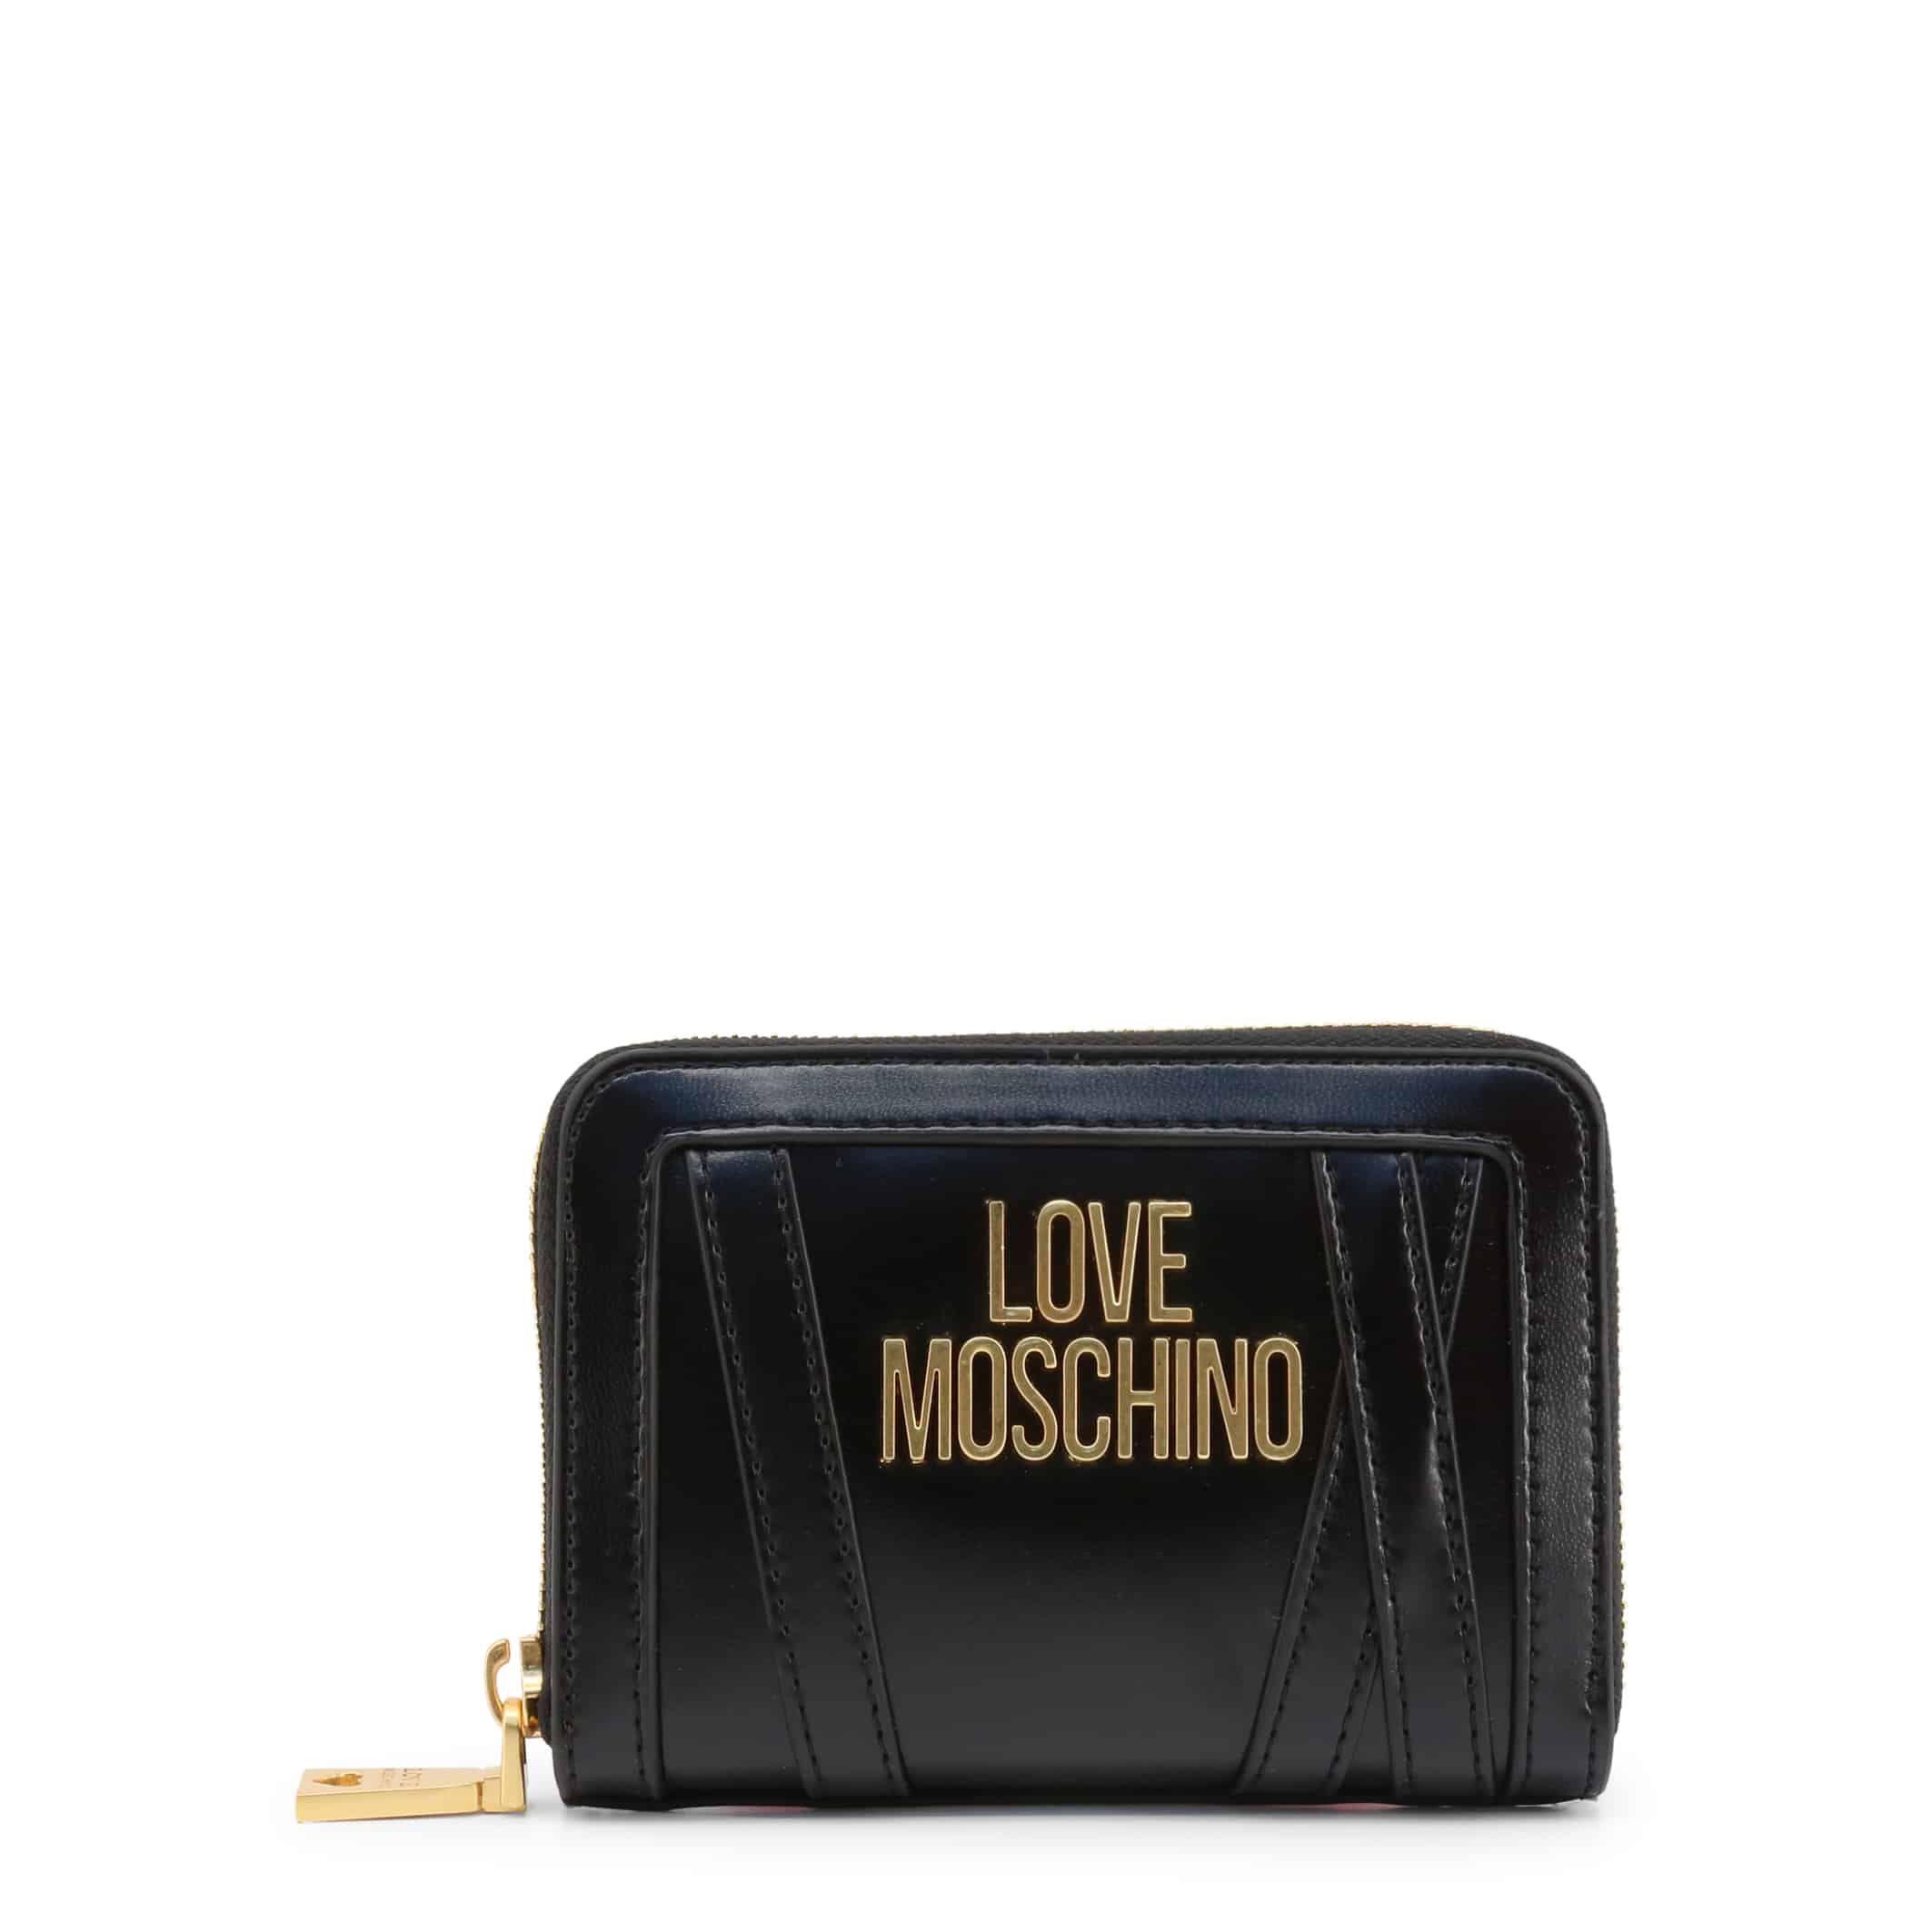 Love Moschino – JC5648PP0BKS – Zwart Designeritems.nl